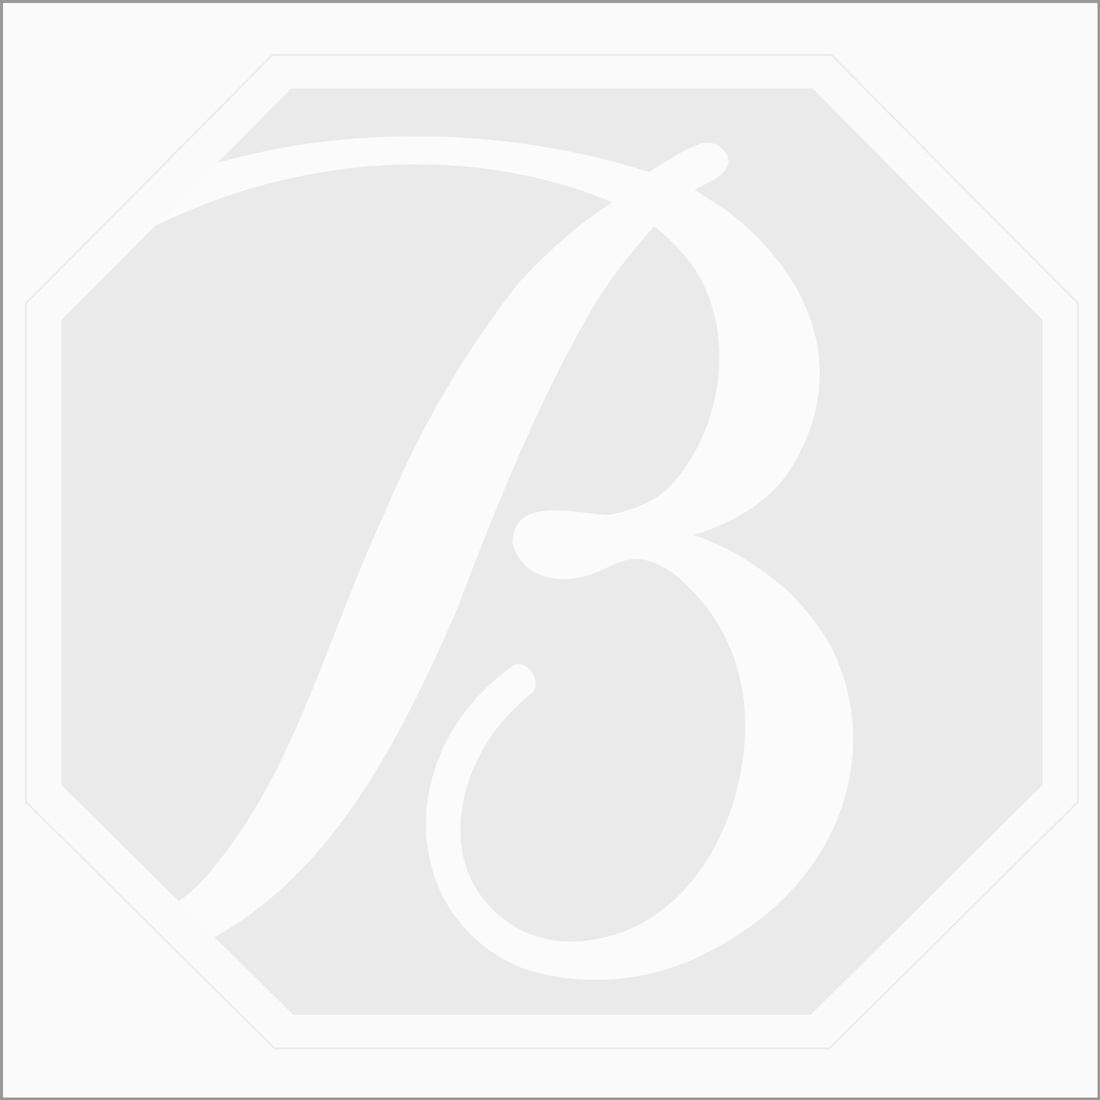 8 Pieces - Medium Tones Multi-Sapphire Rose Cut - 12 x 12 mm to 14 x 14 mm - 68.42 carats (MSRC1305)